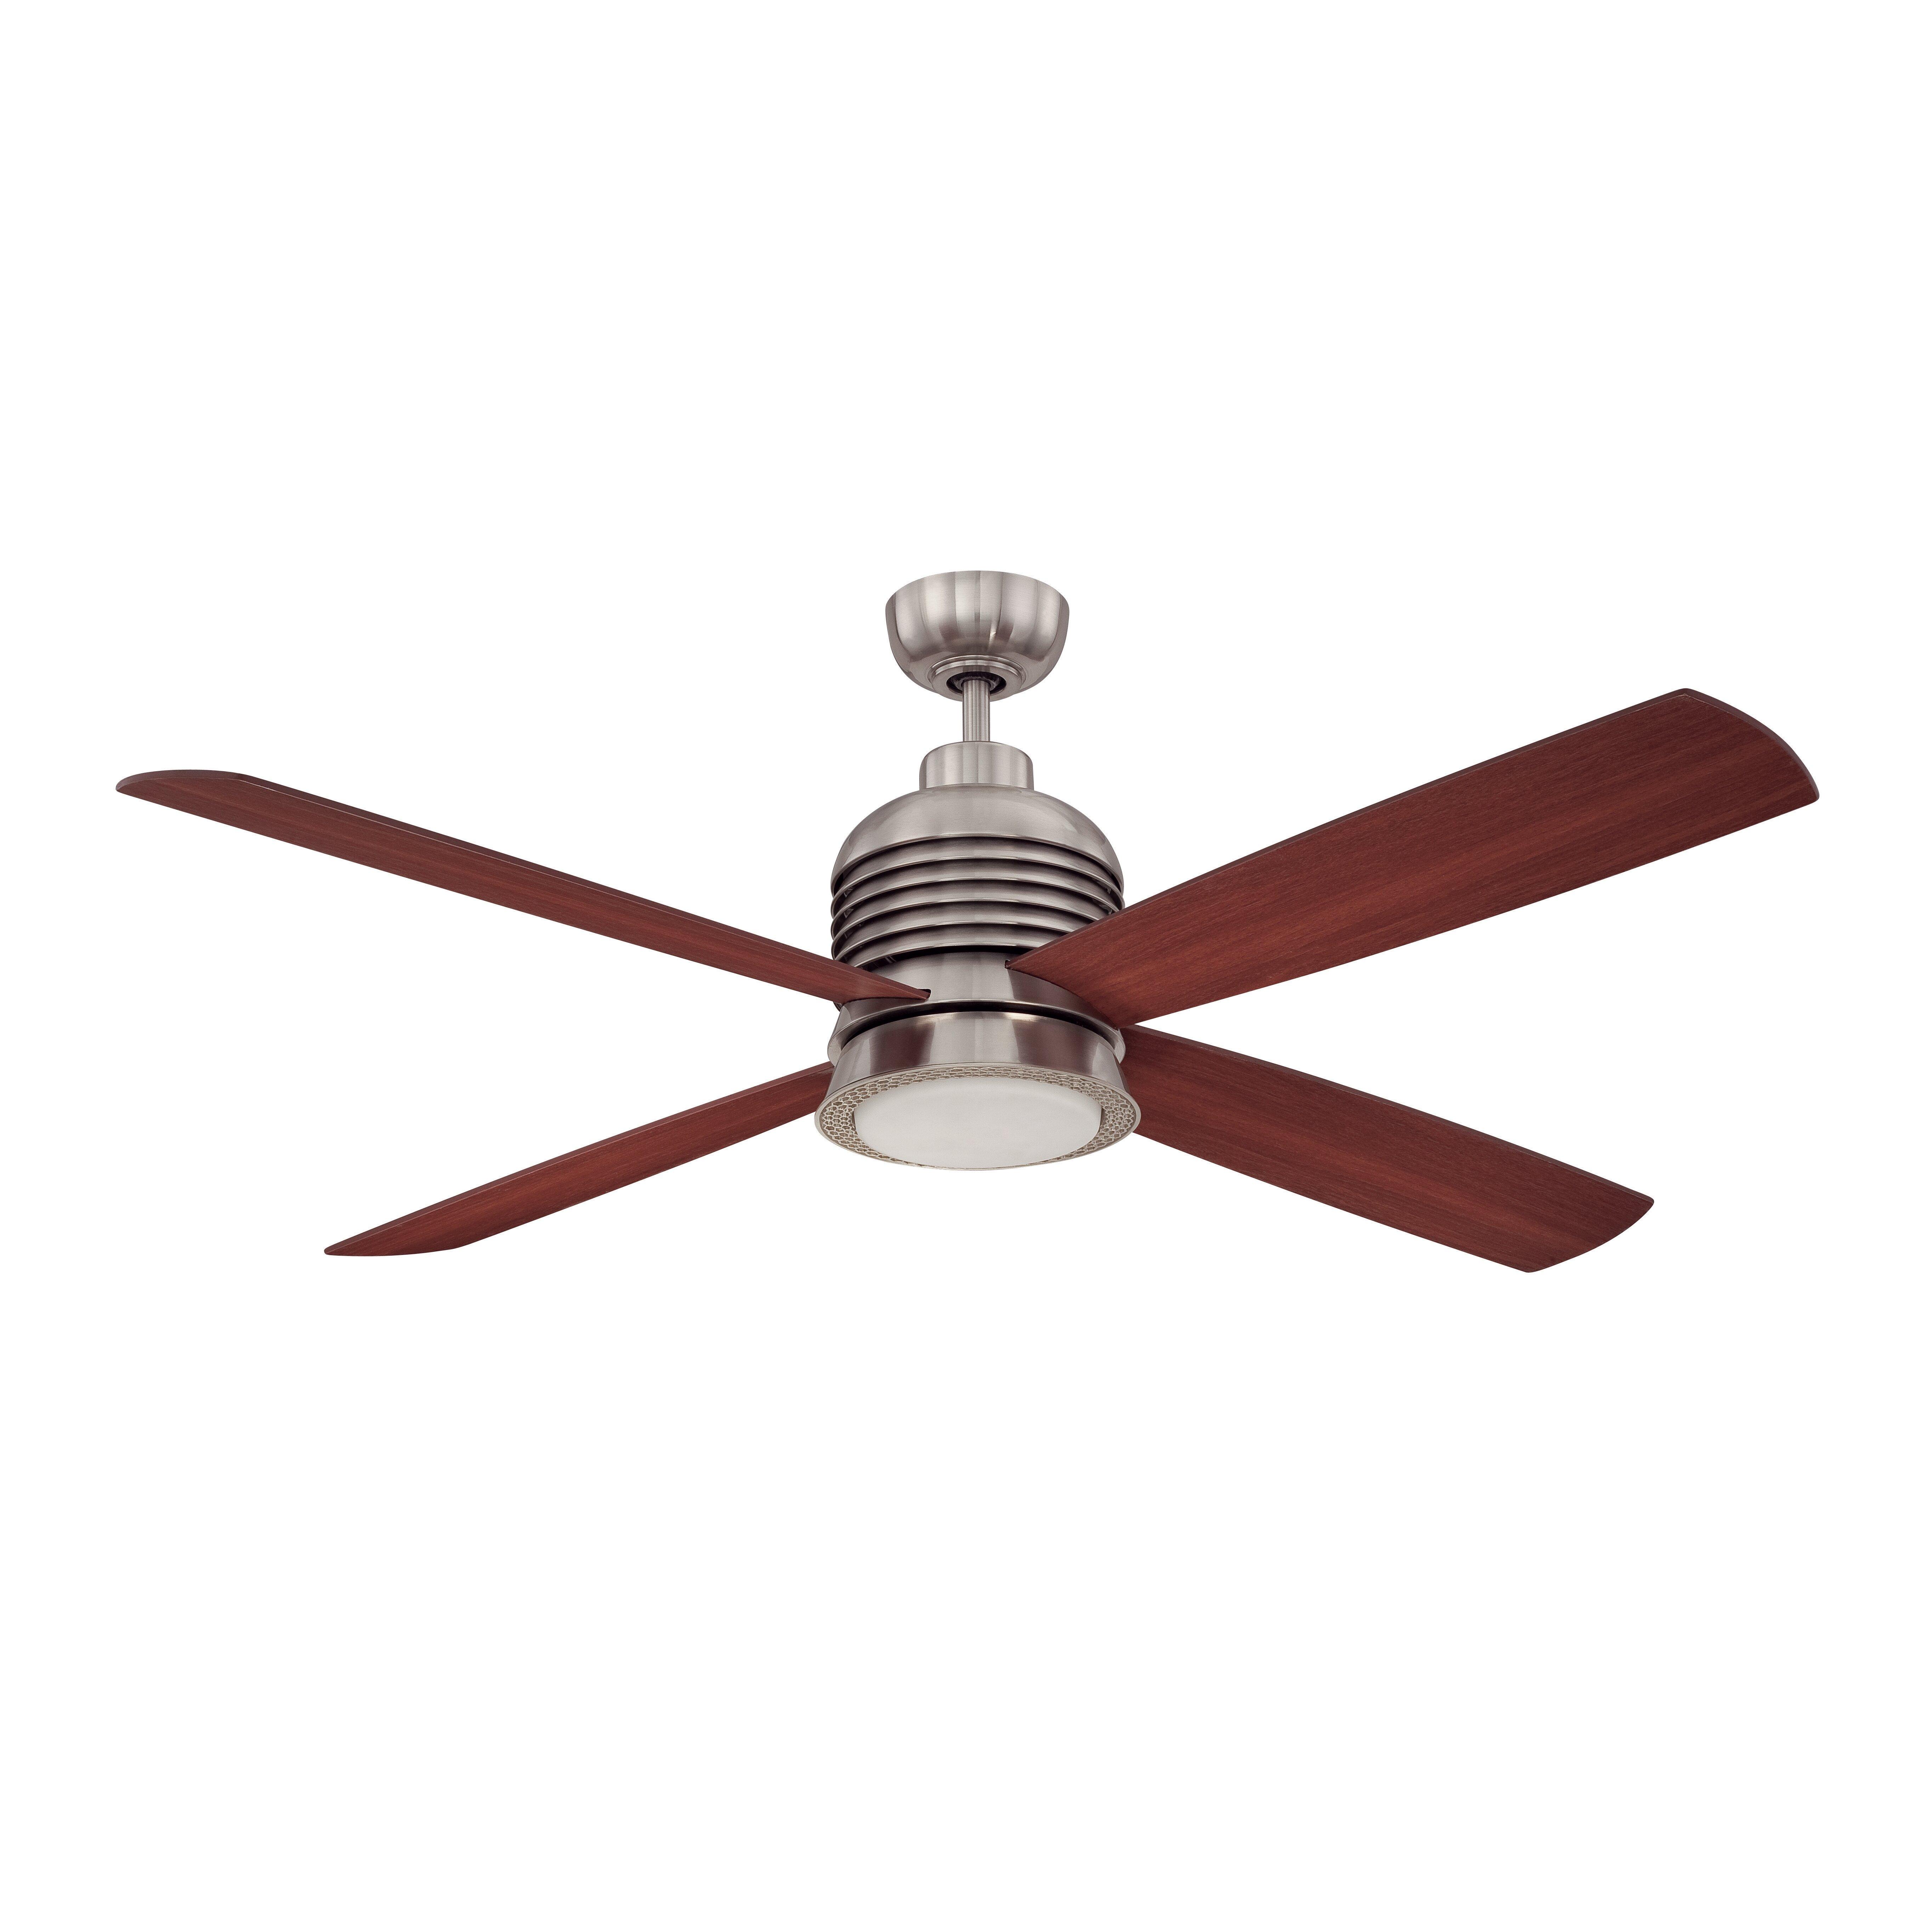 "Ellington 56"" Metron 4 Blade Ceiling Fan With Wall Remote"